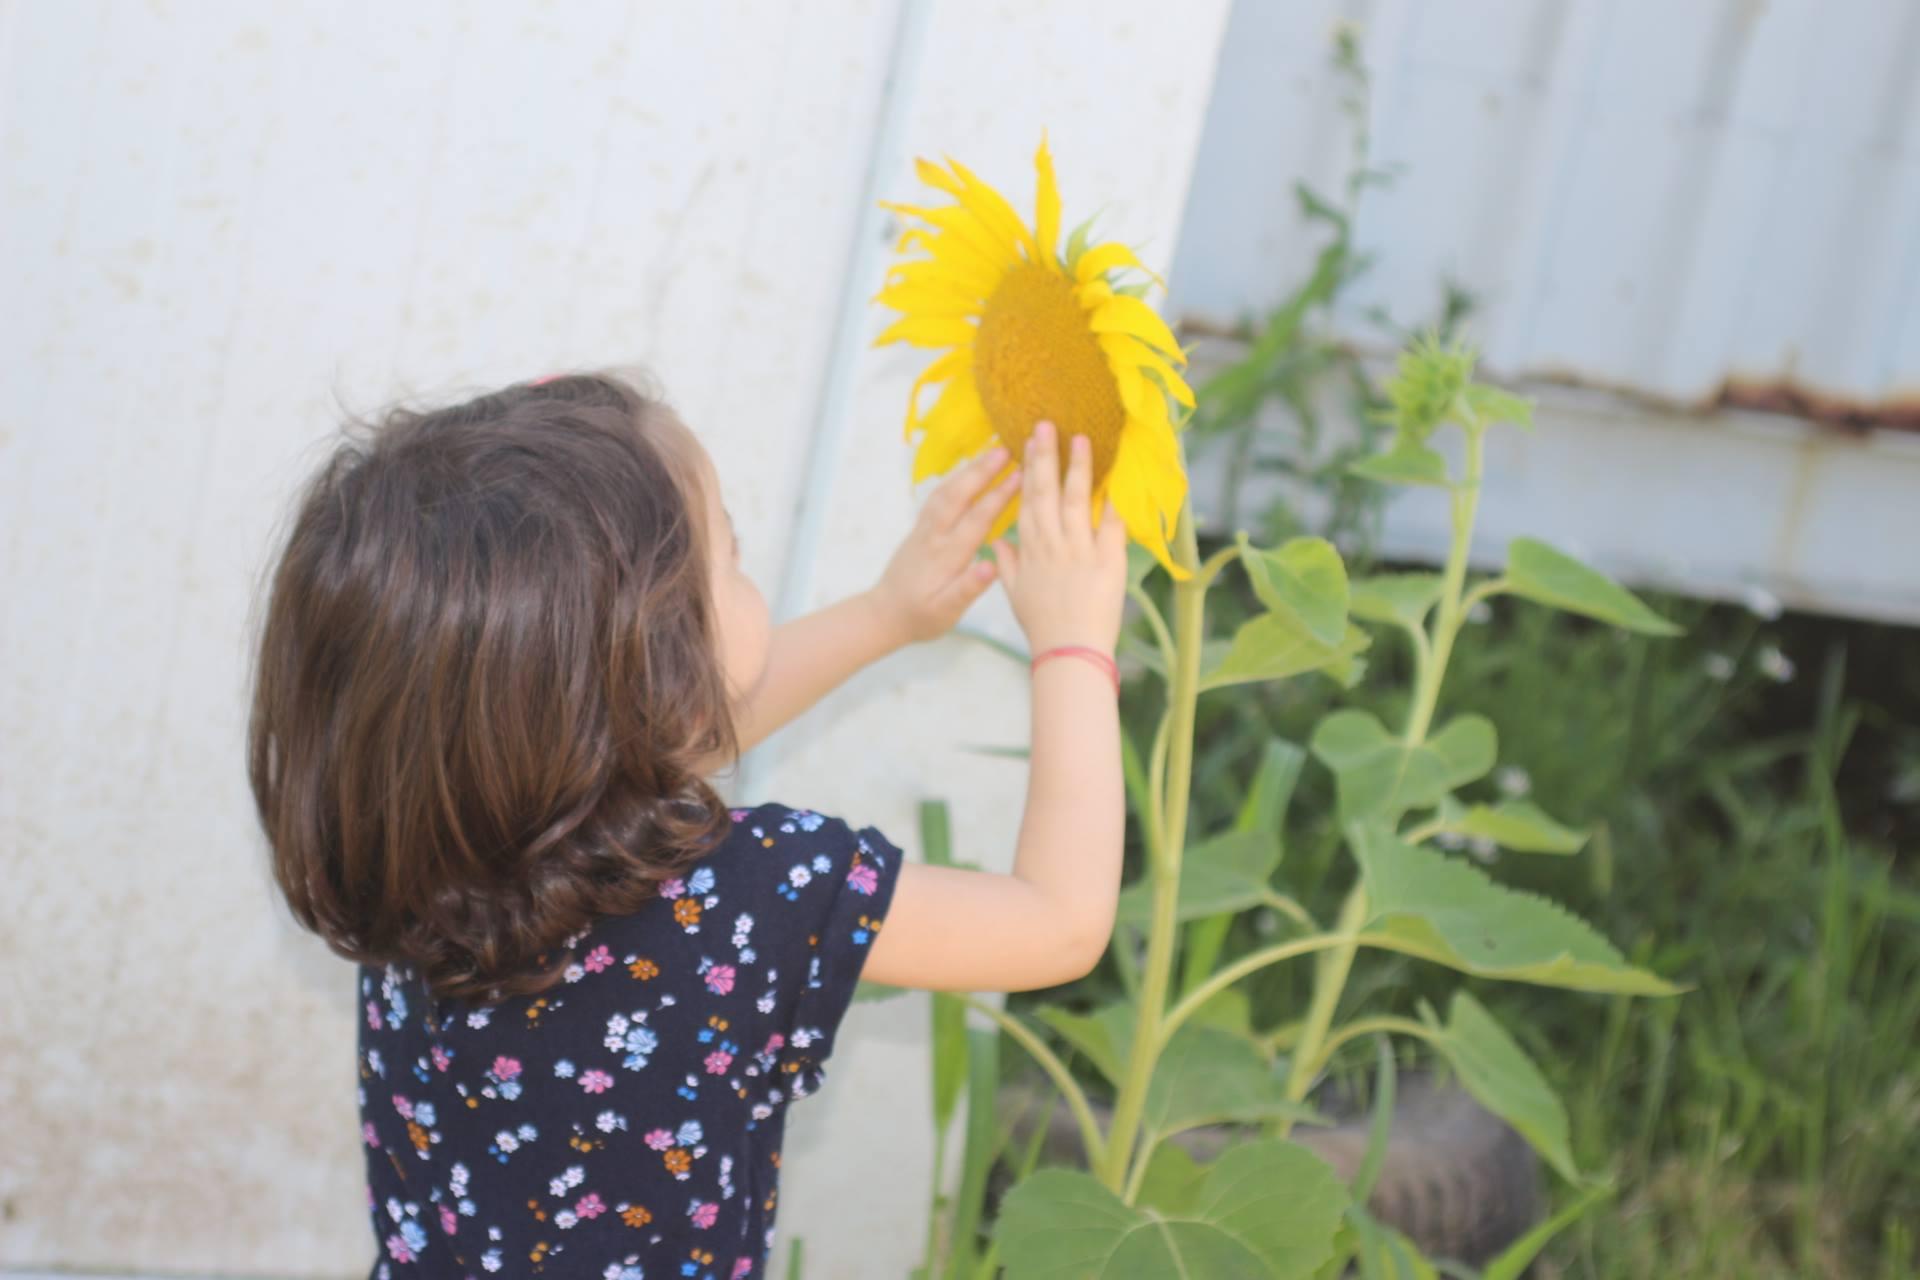 visite pédagogique jardin mélifere 2.jpg